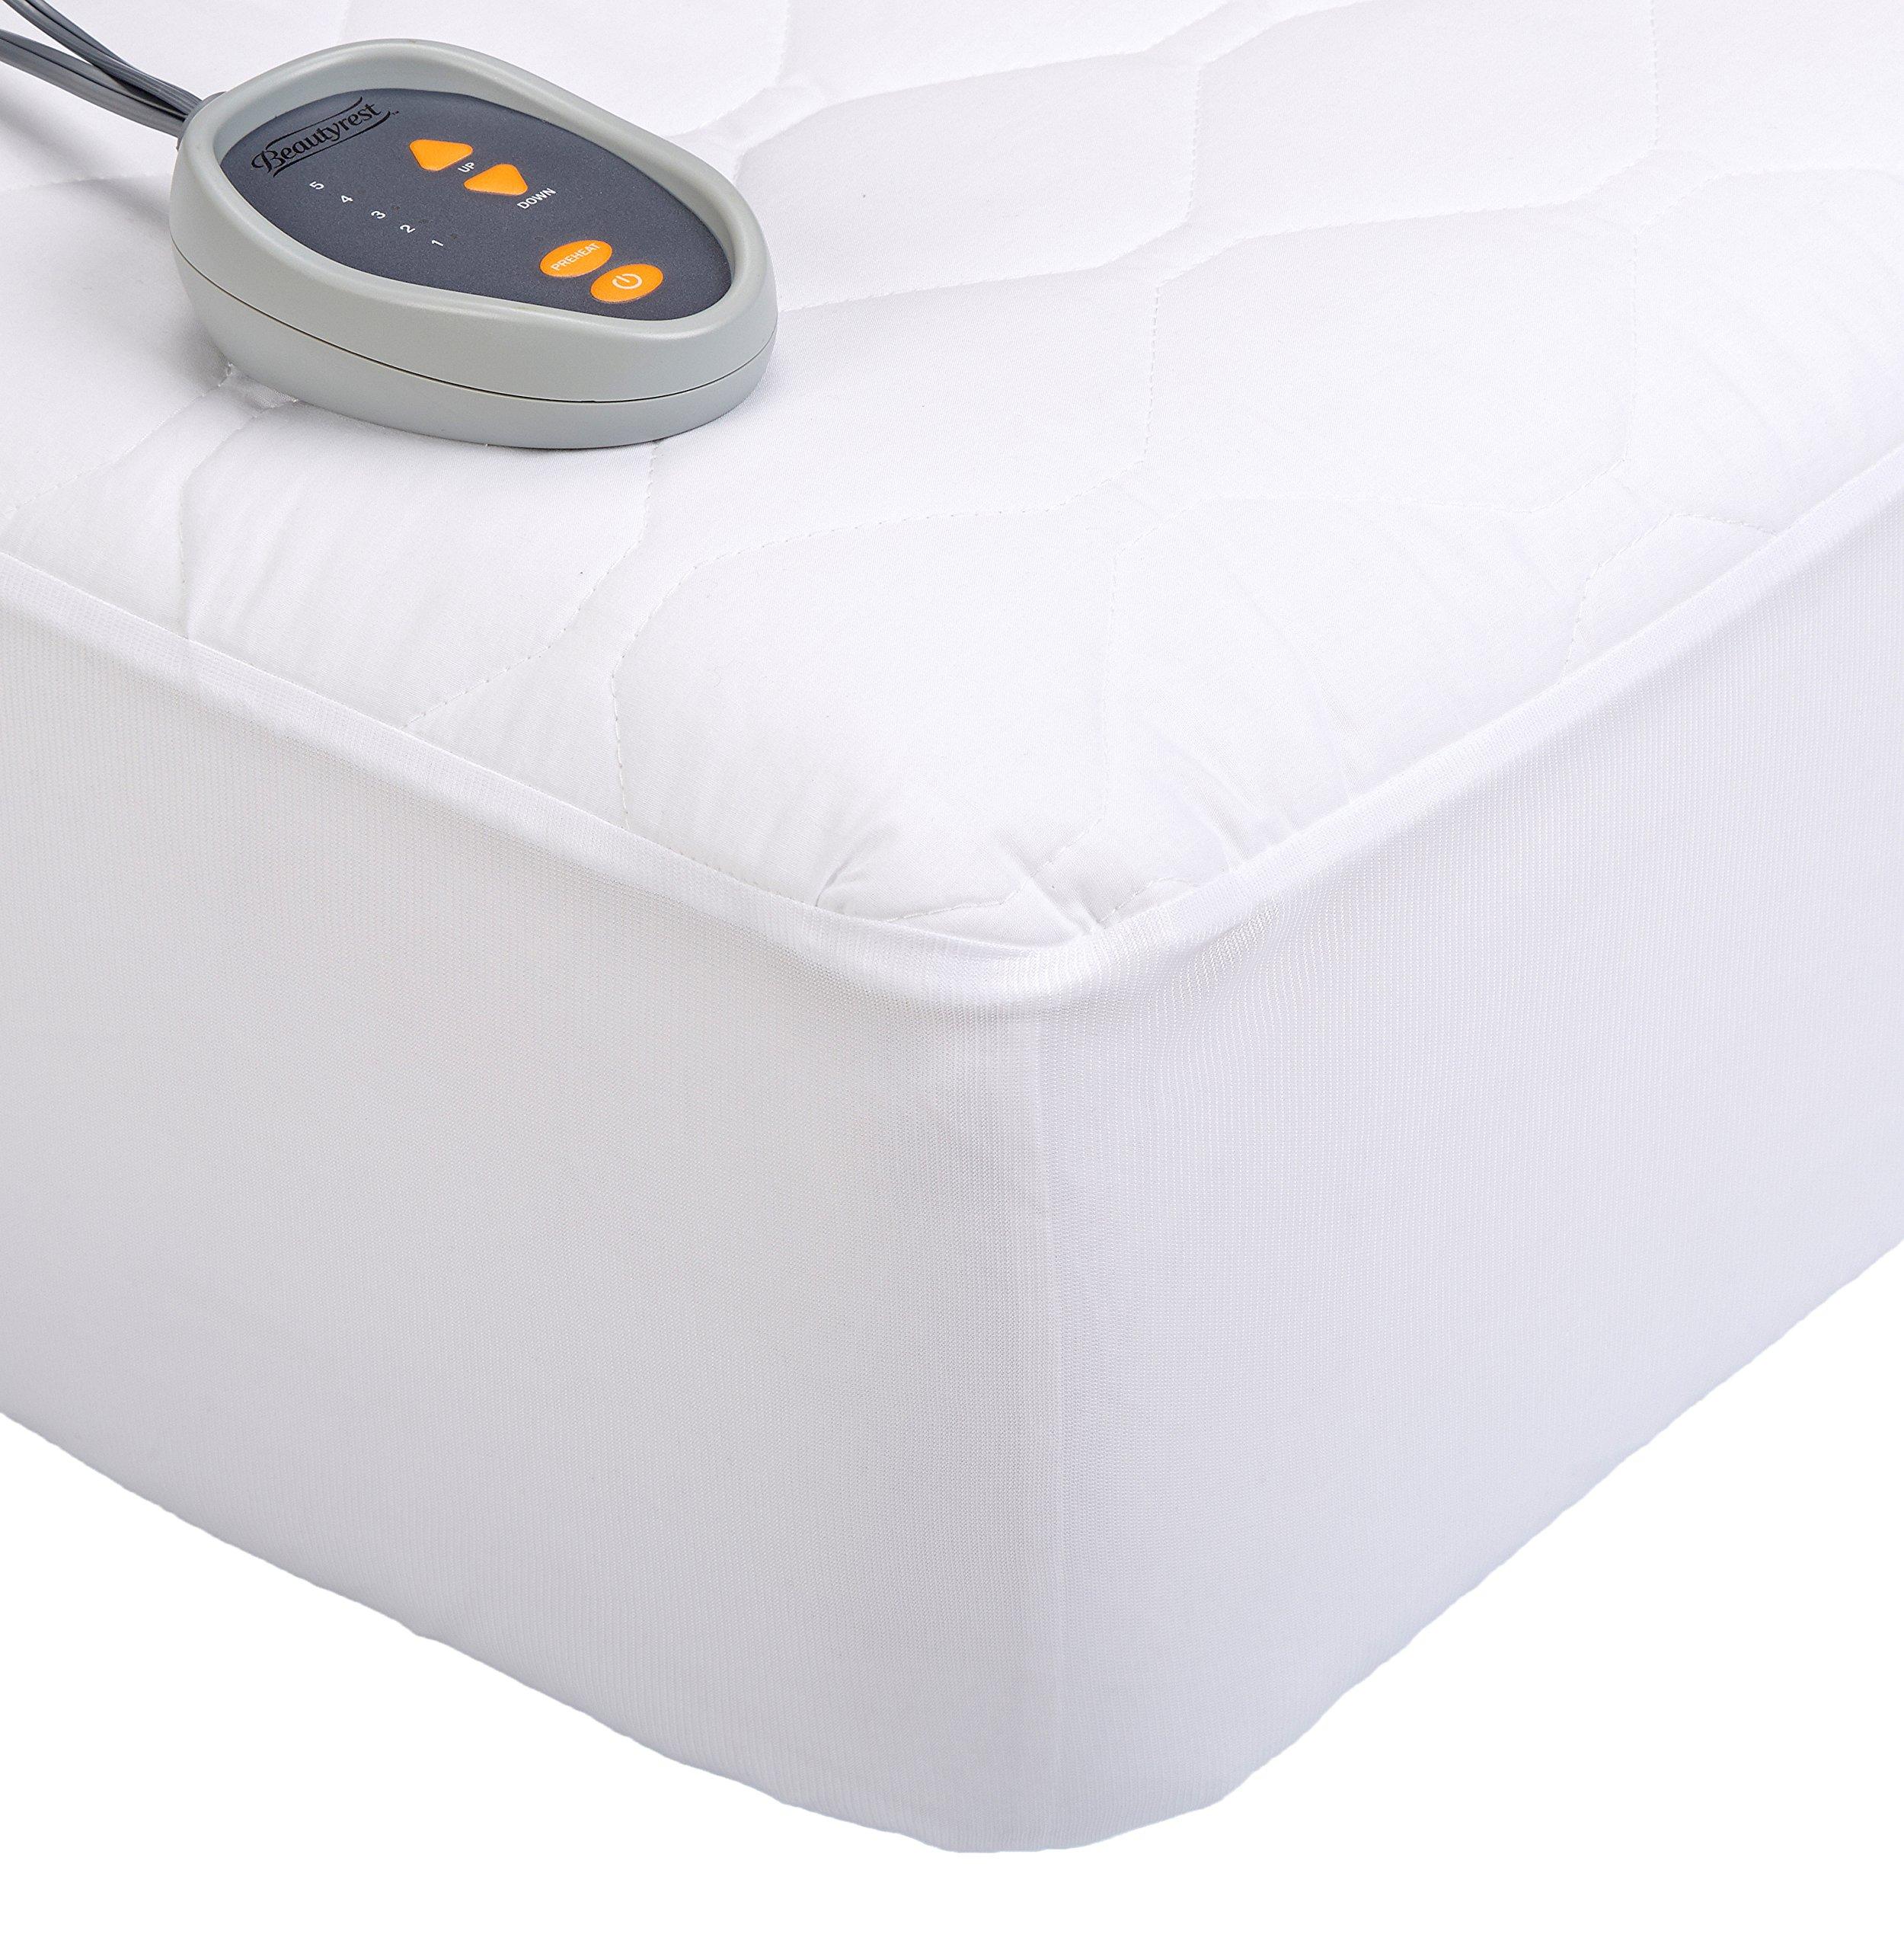 Beautyrest Down 200-Thread Count Cotton Blend Heated Mattress Pad, King, White